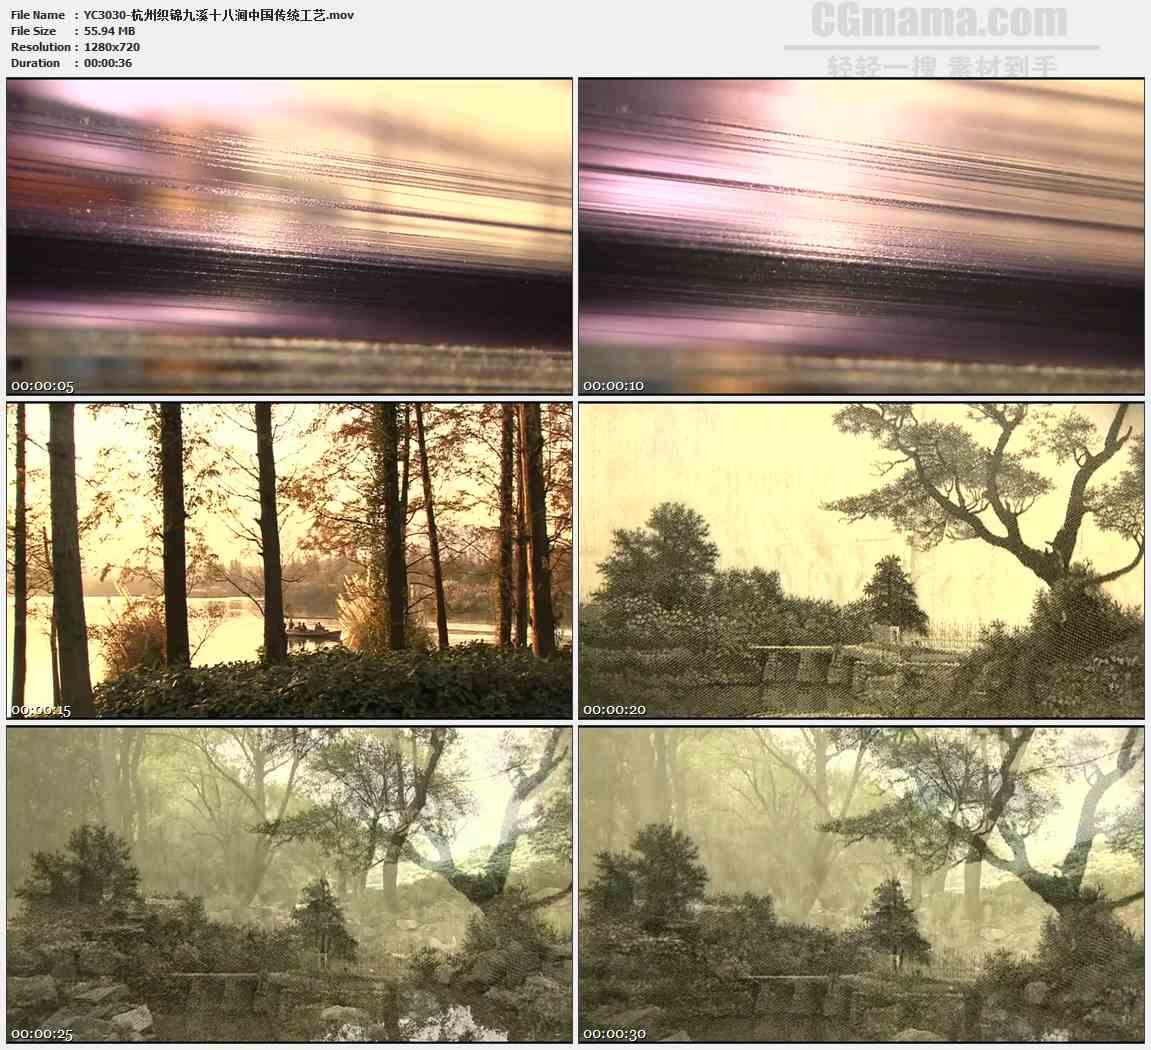 YC3030-杭州织锦九溪十八涧中国传统工艺高清实拍视频素材